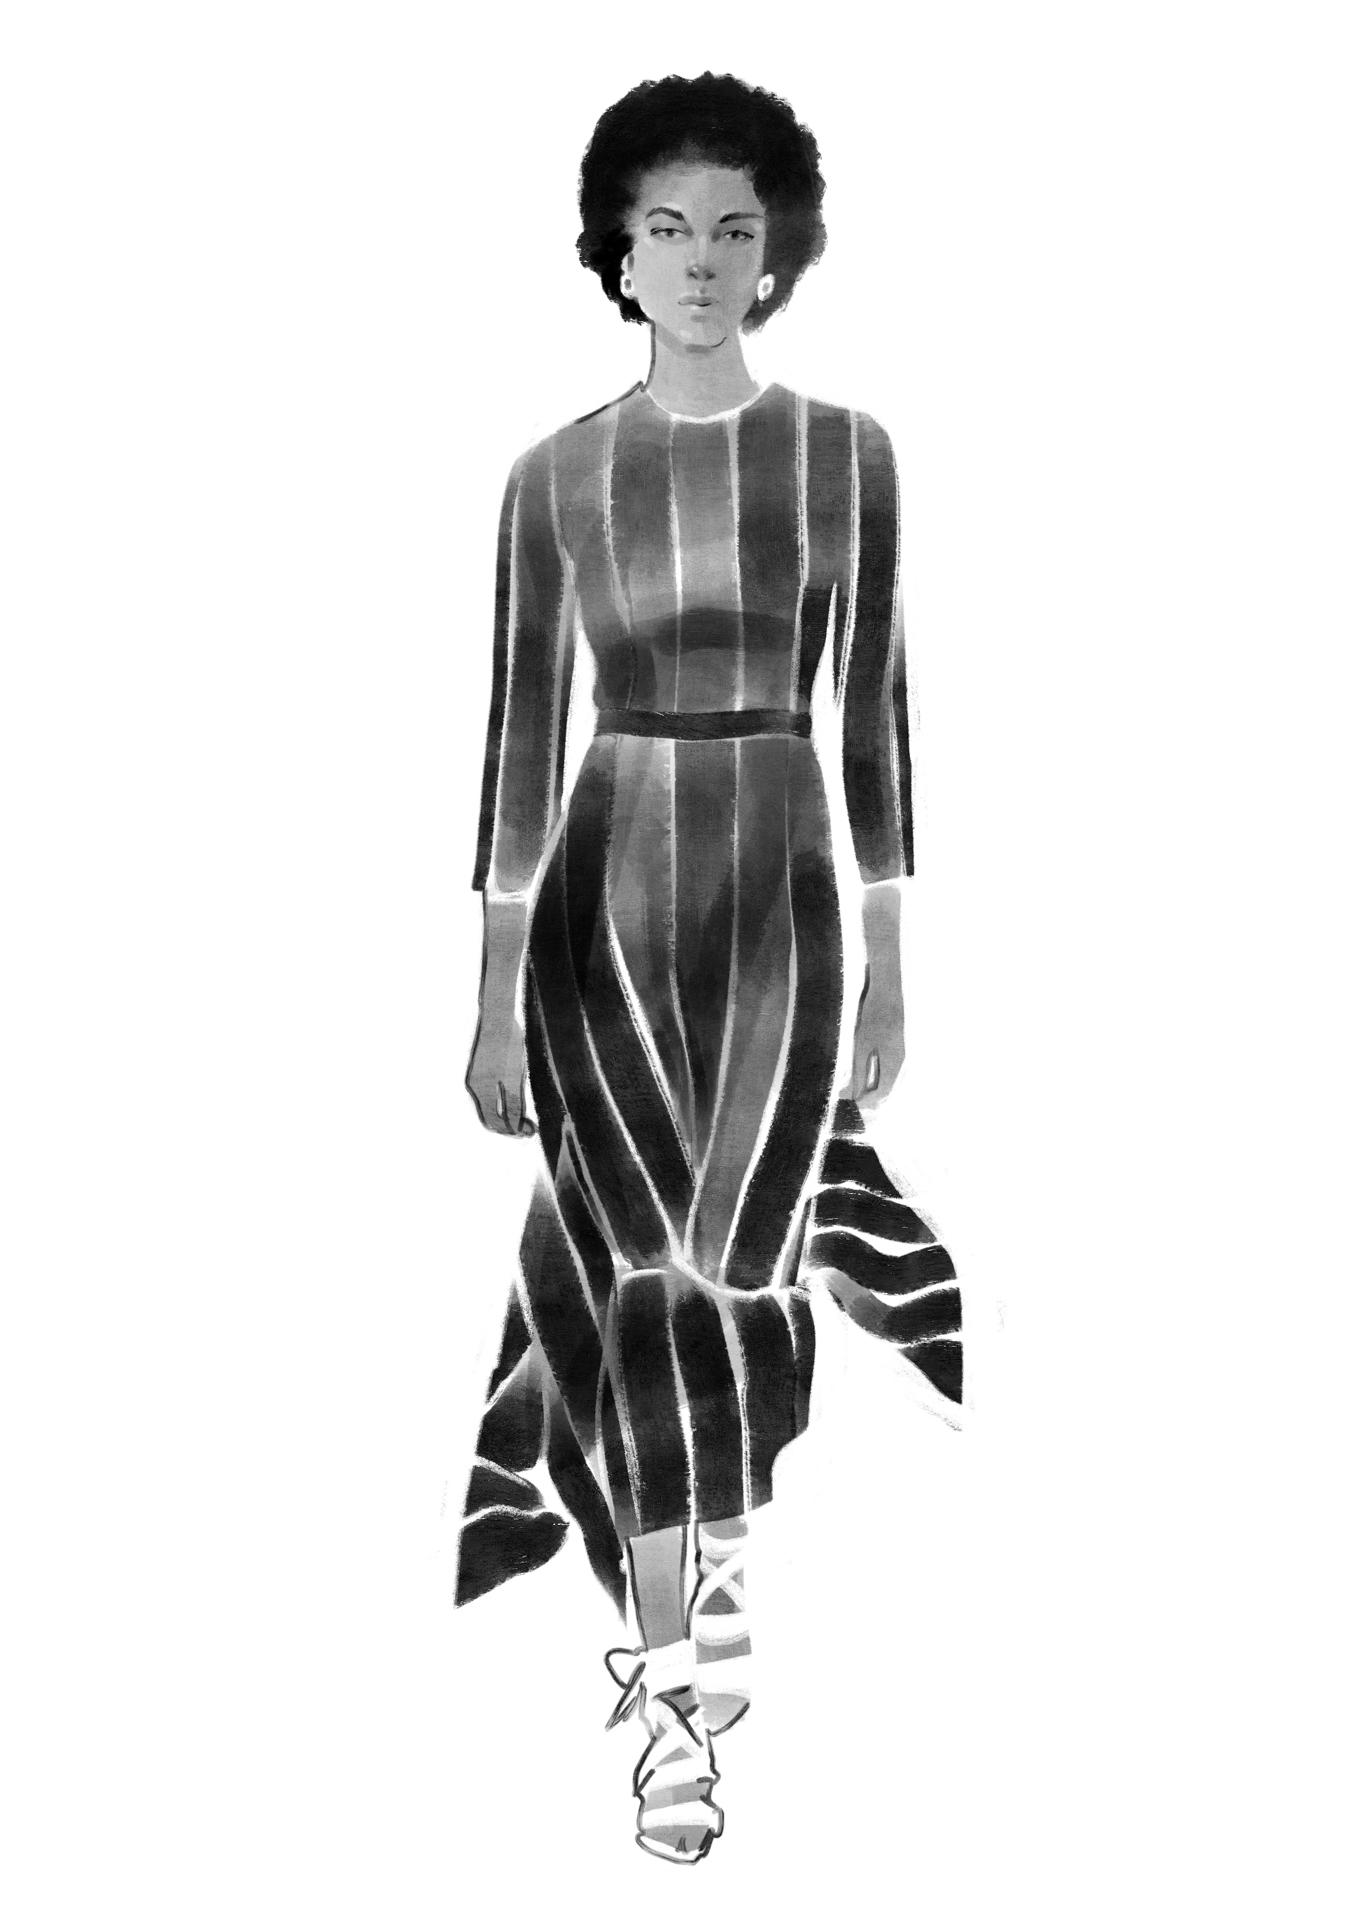 fashion_0007_Слой 32.jpg